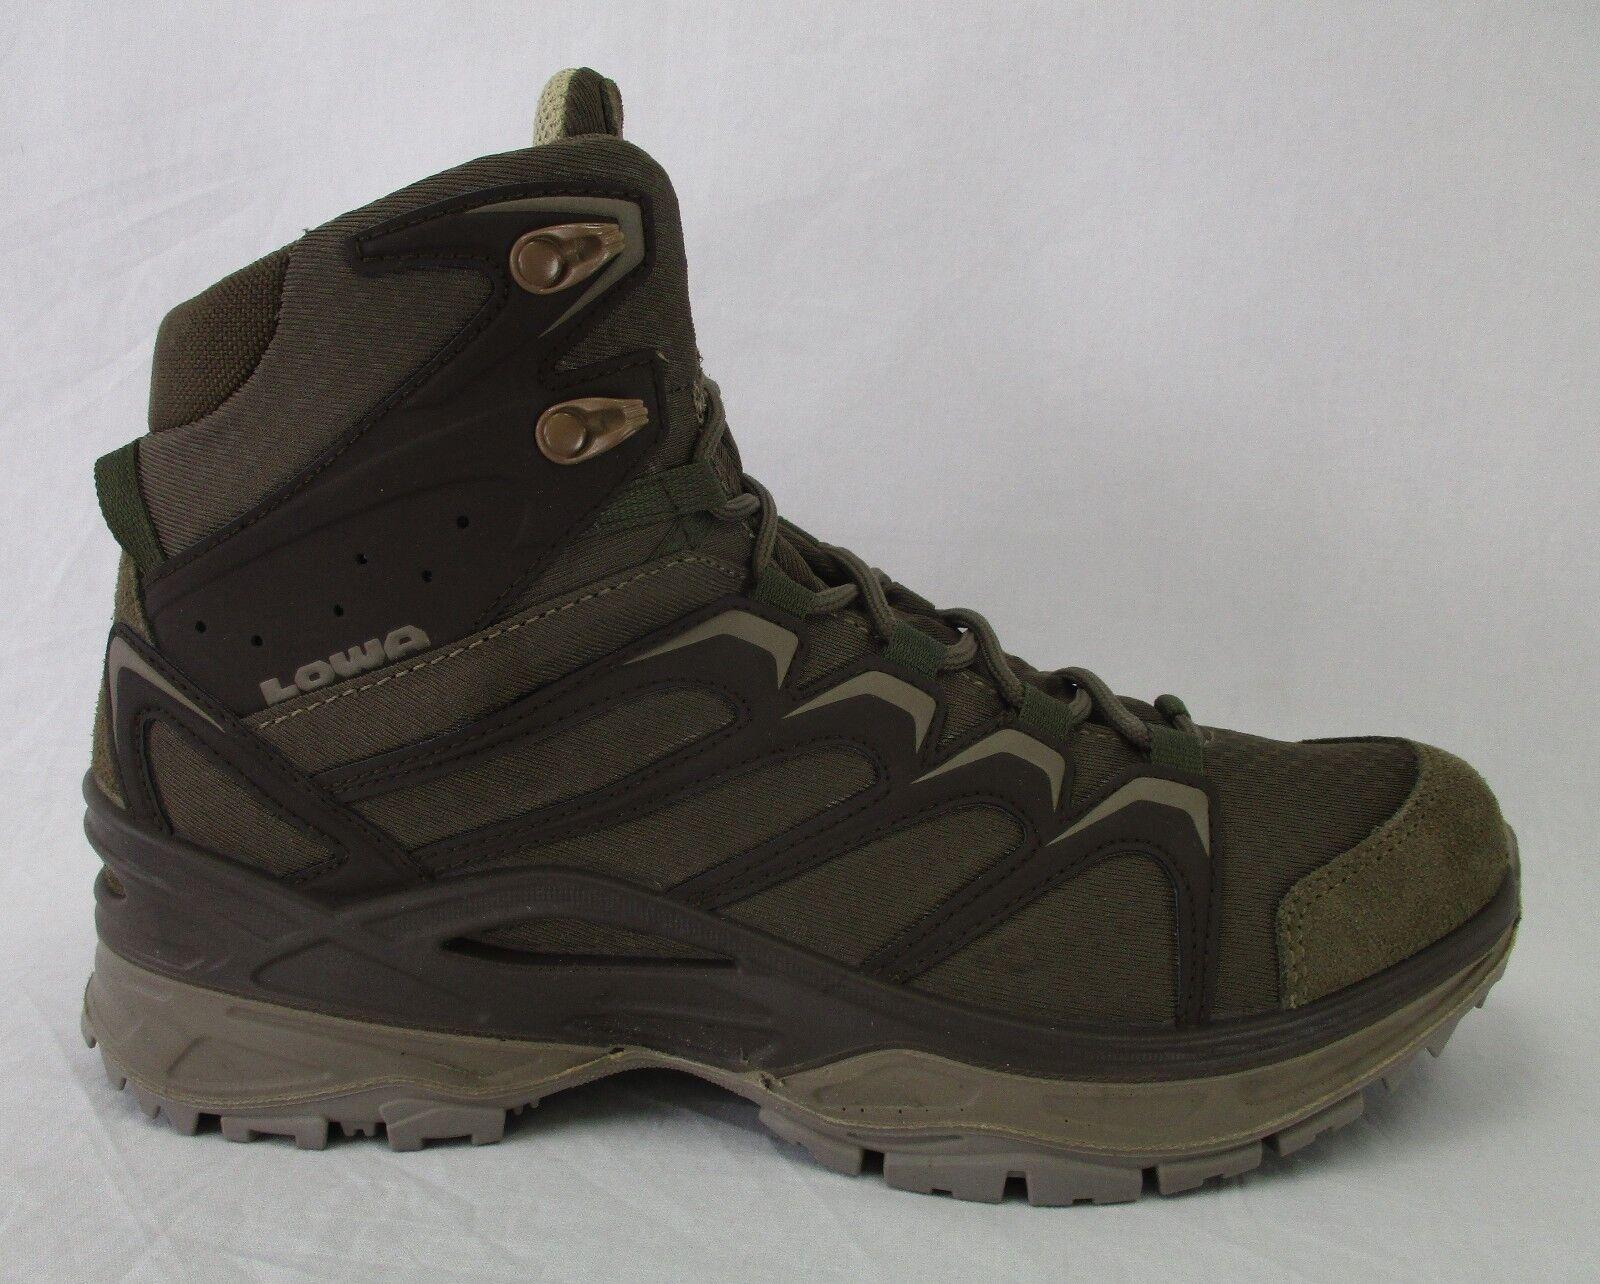 Lowa Uomo Innox Mid TF TF Mid Boots 310605 0736 Coyote Size 10 2d2623